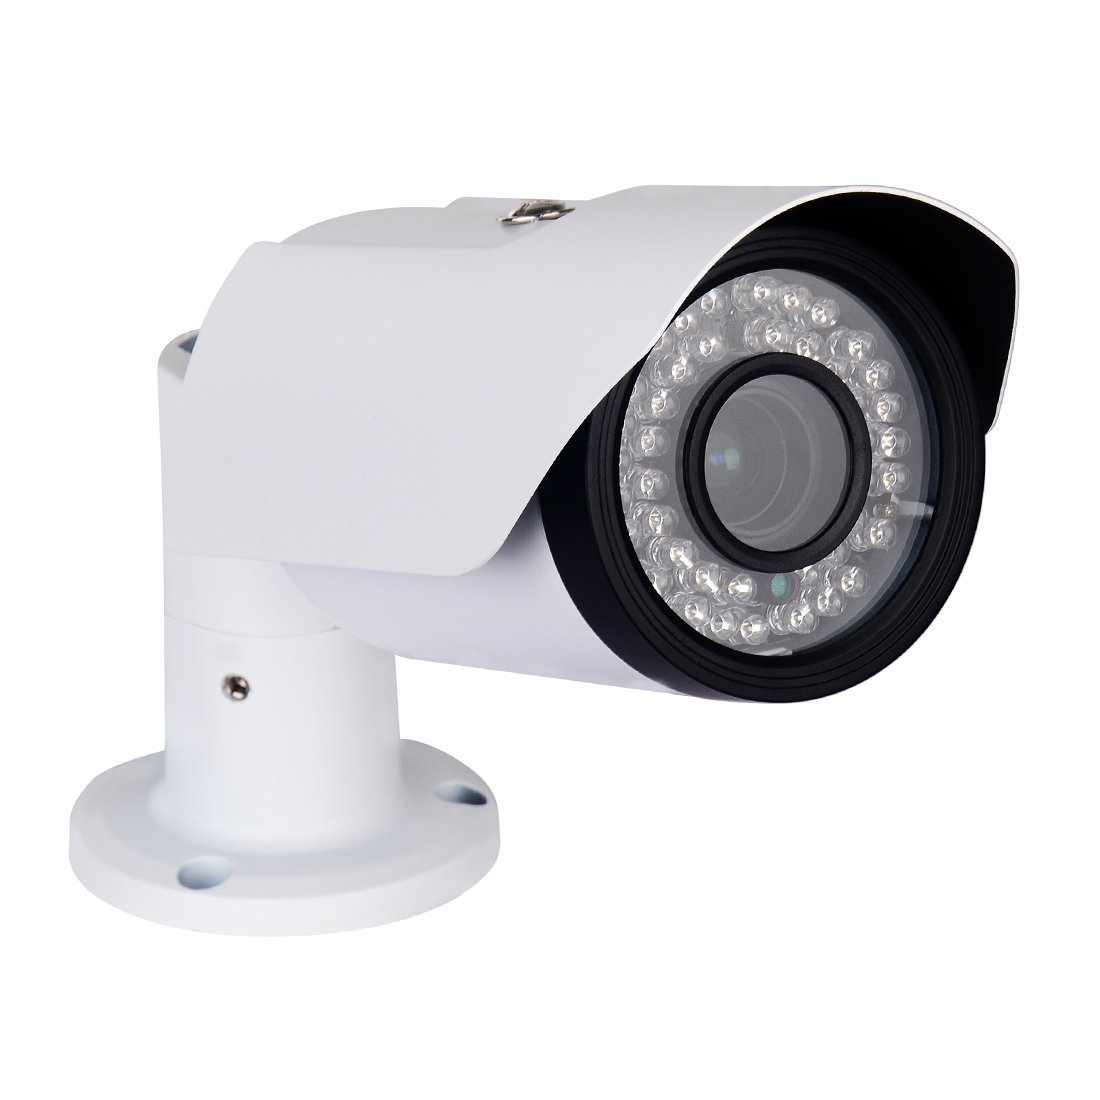 【WEB限定】 HD-SDI 防犯カメラ HD-SDI 240万画素監視カメラf=3.6mmの画角約60°広角レンズ搭載 防犯カメラ 1080P25fps高の画質のビデオは入力します B01G3YXV9S 日本防犯システム B01G3YXV9S, ex虎。:d2bedc8b --- a0267596.xsph.ru